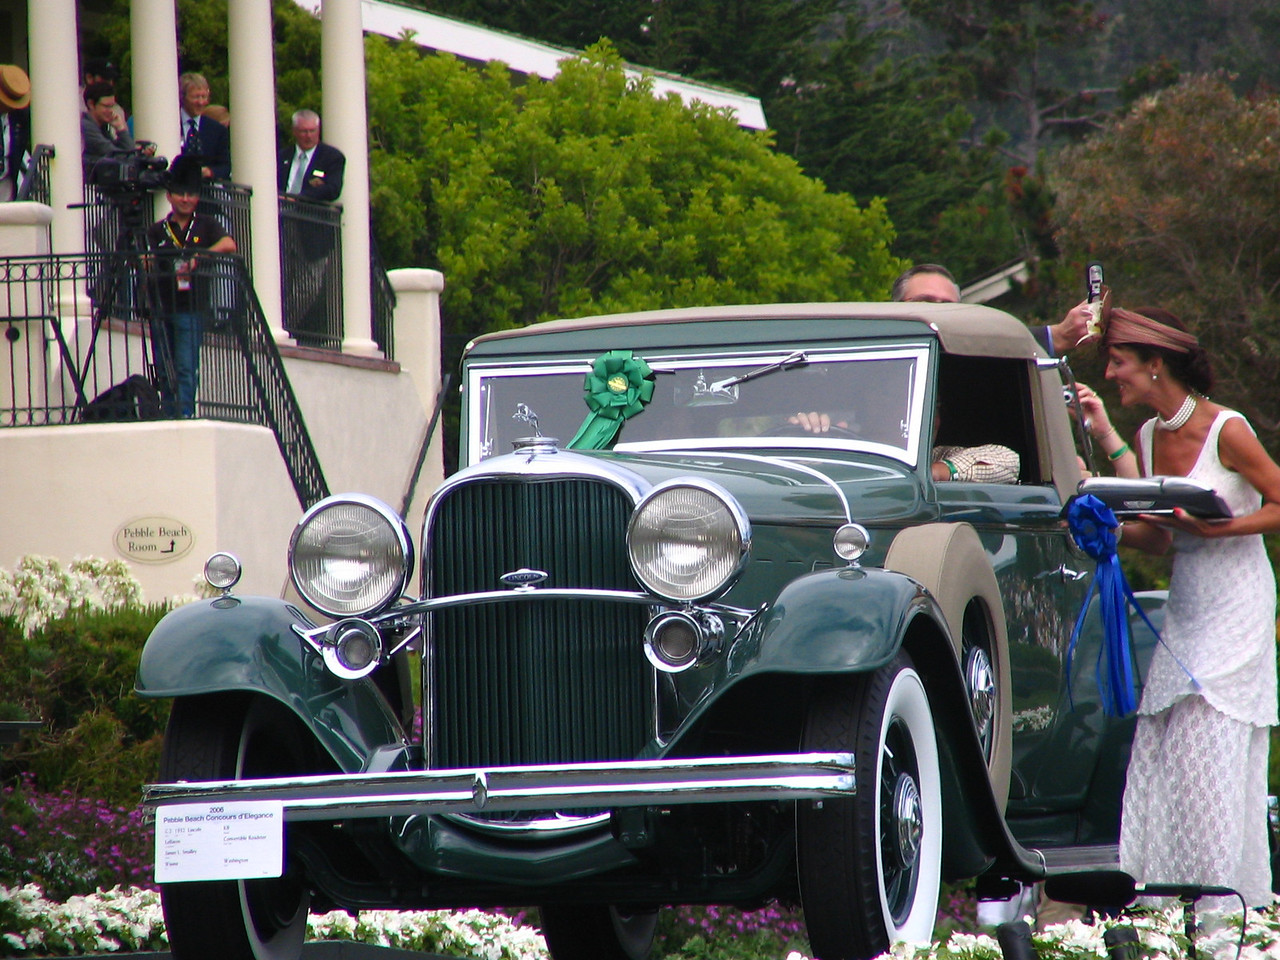 Class C-2, American Classic Open 1932-1941, Winner -- 1932 Lincoln KB LeBaron Convertible Roadster